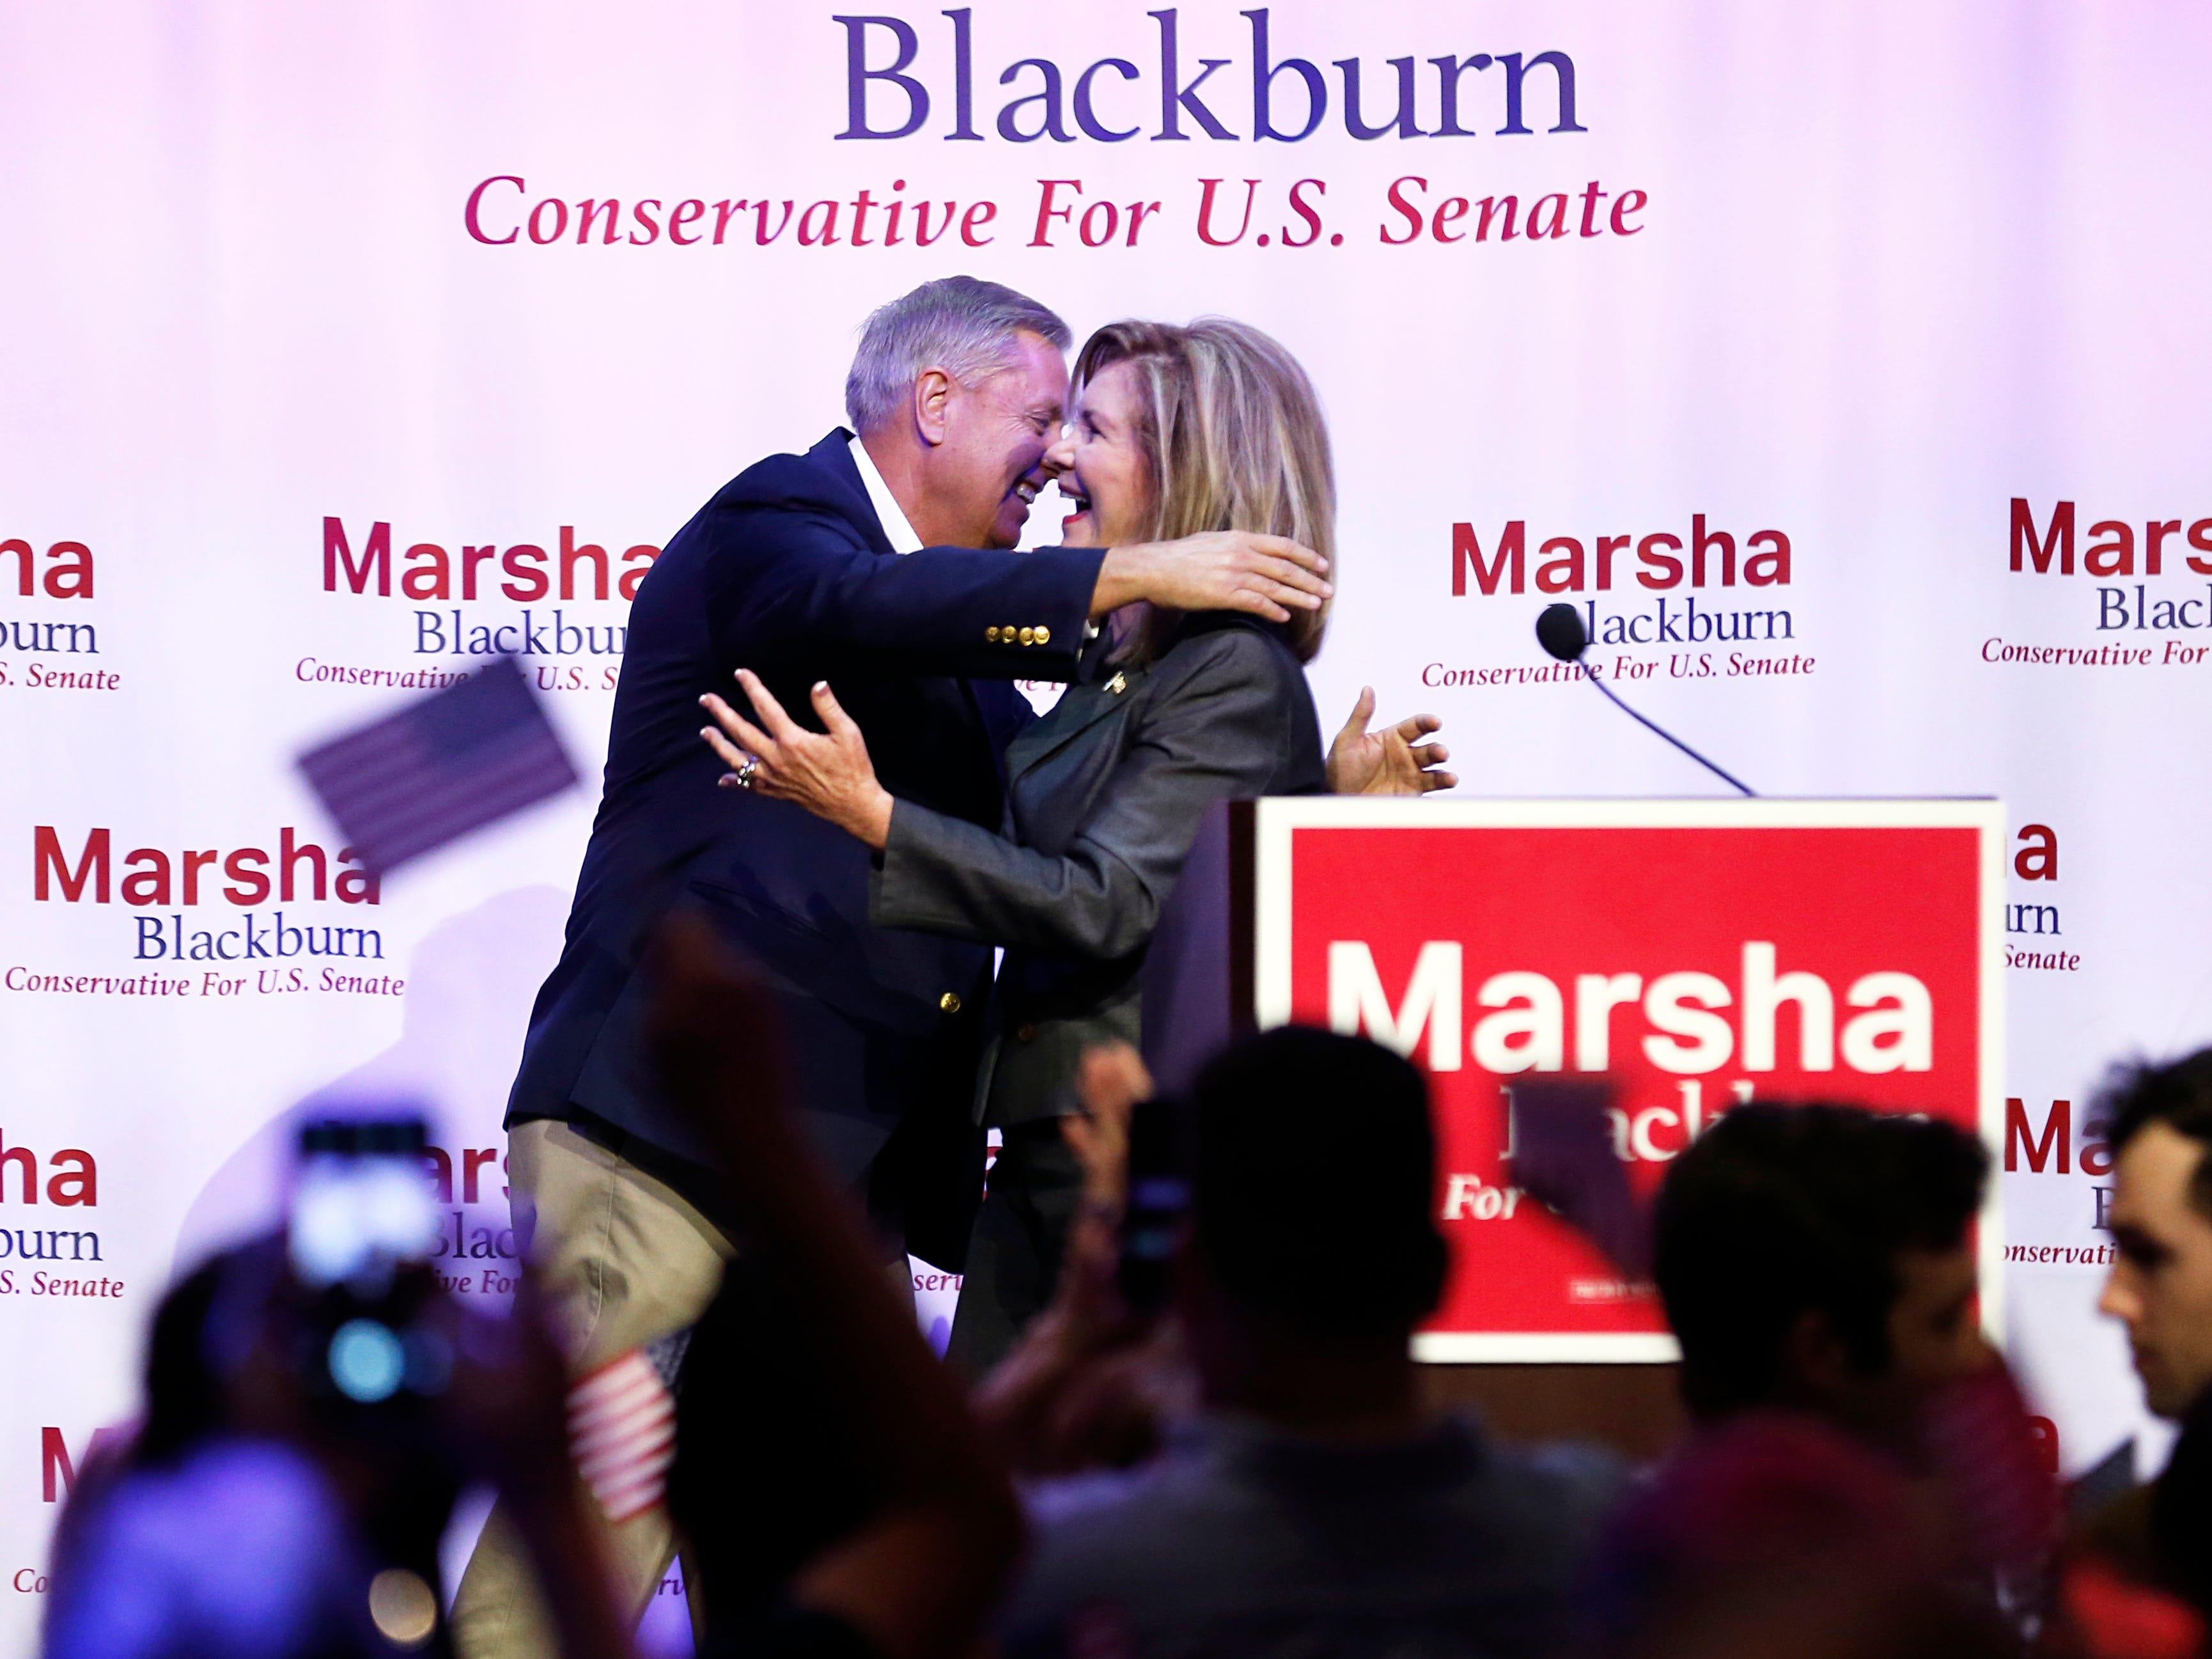 U.S. Sen. Lindsey Graham, R-S.C., hugs U.S. Rep. Marsha Blackburn during a campaign event for the Republican Tennessee U.S. Senate candidate Sunday, Oct. 28, 2018, in Nashville, Tenn.